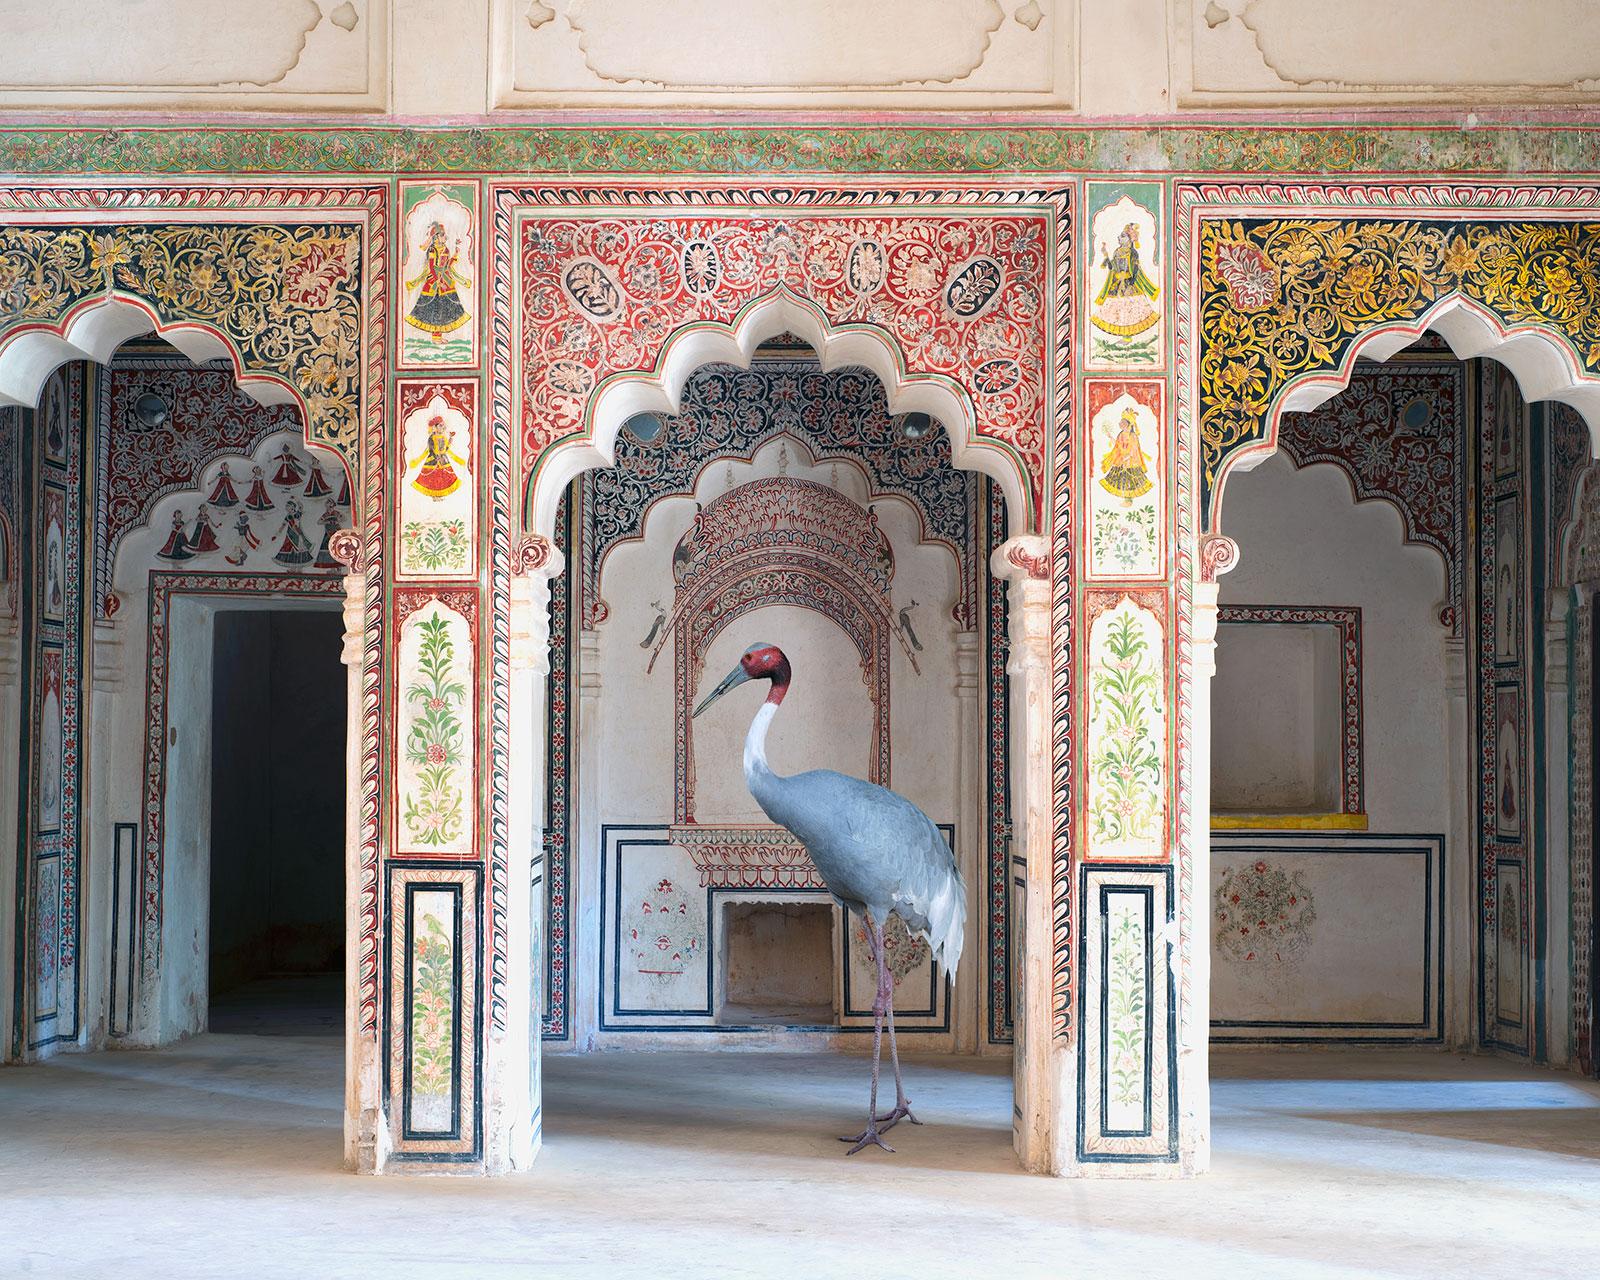 crane in ornate Indian temple